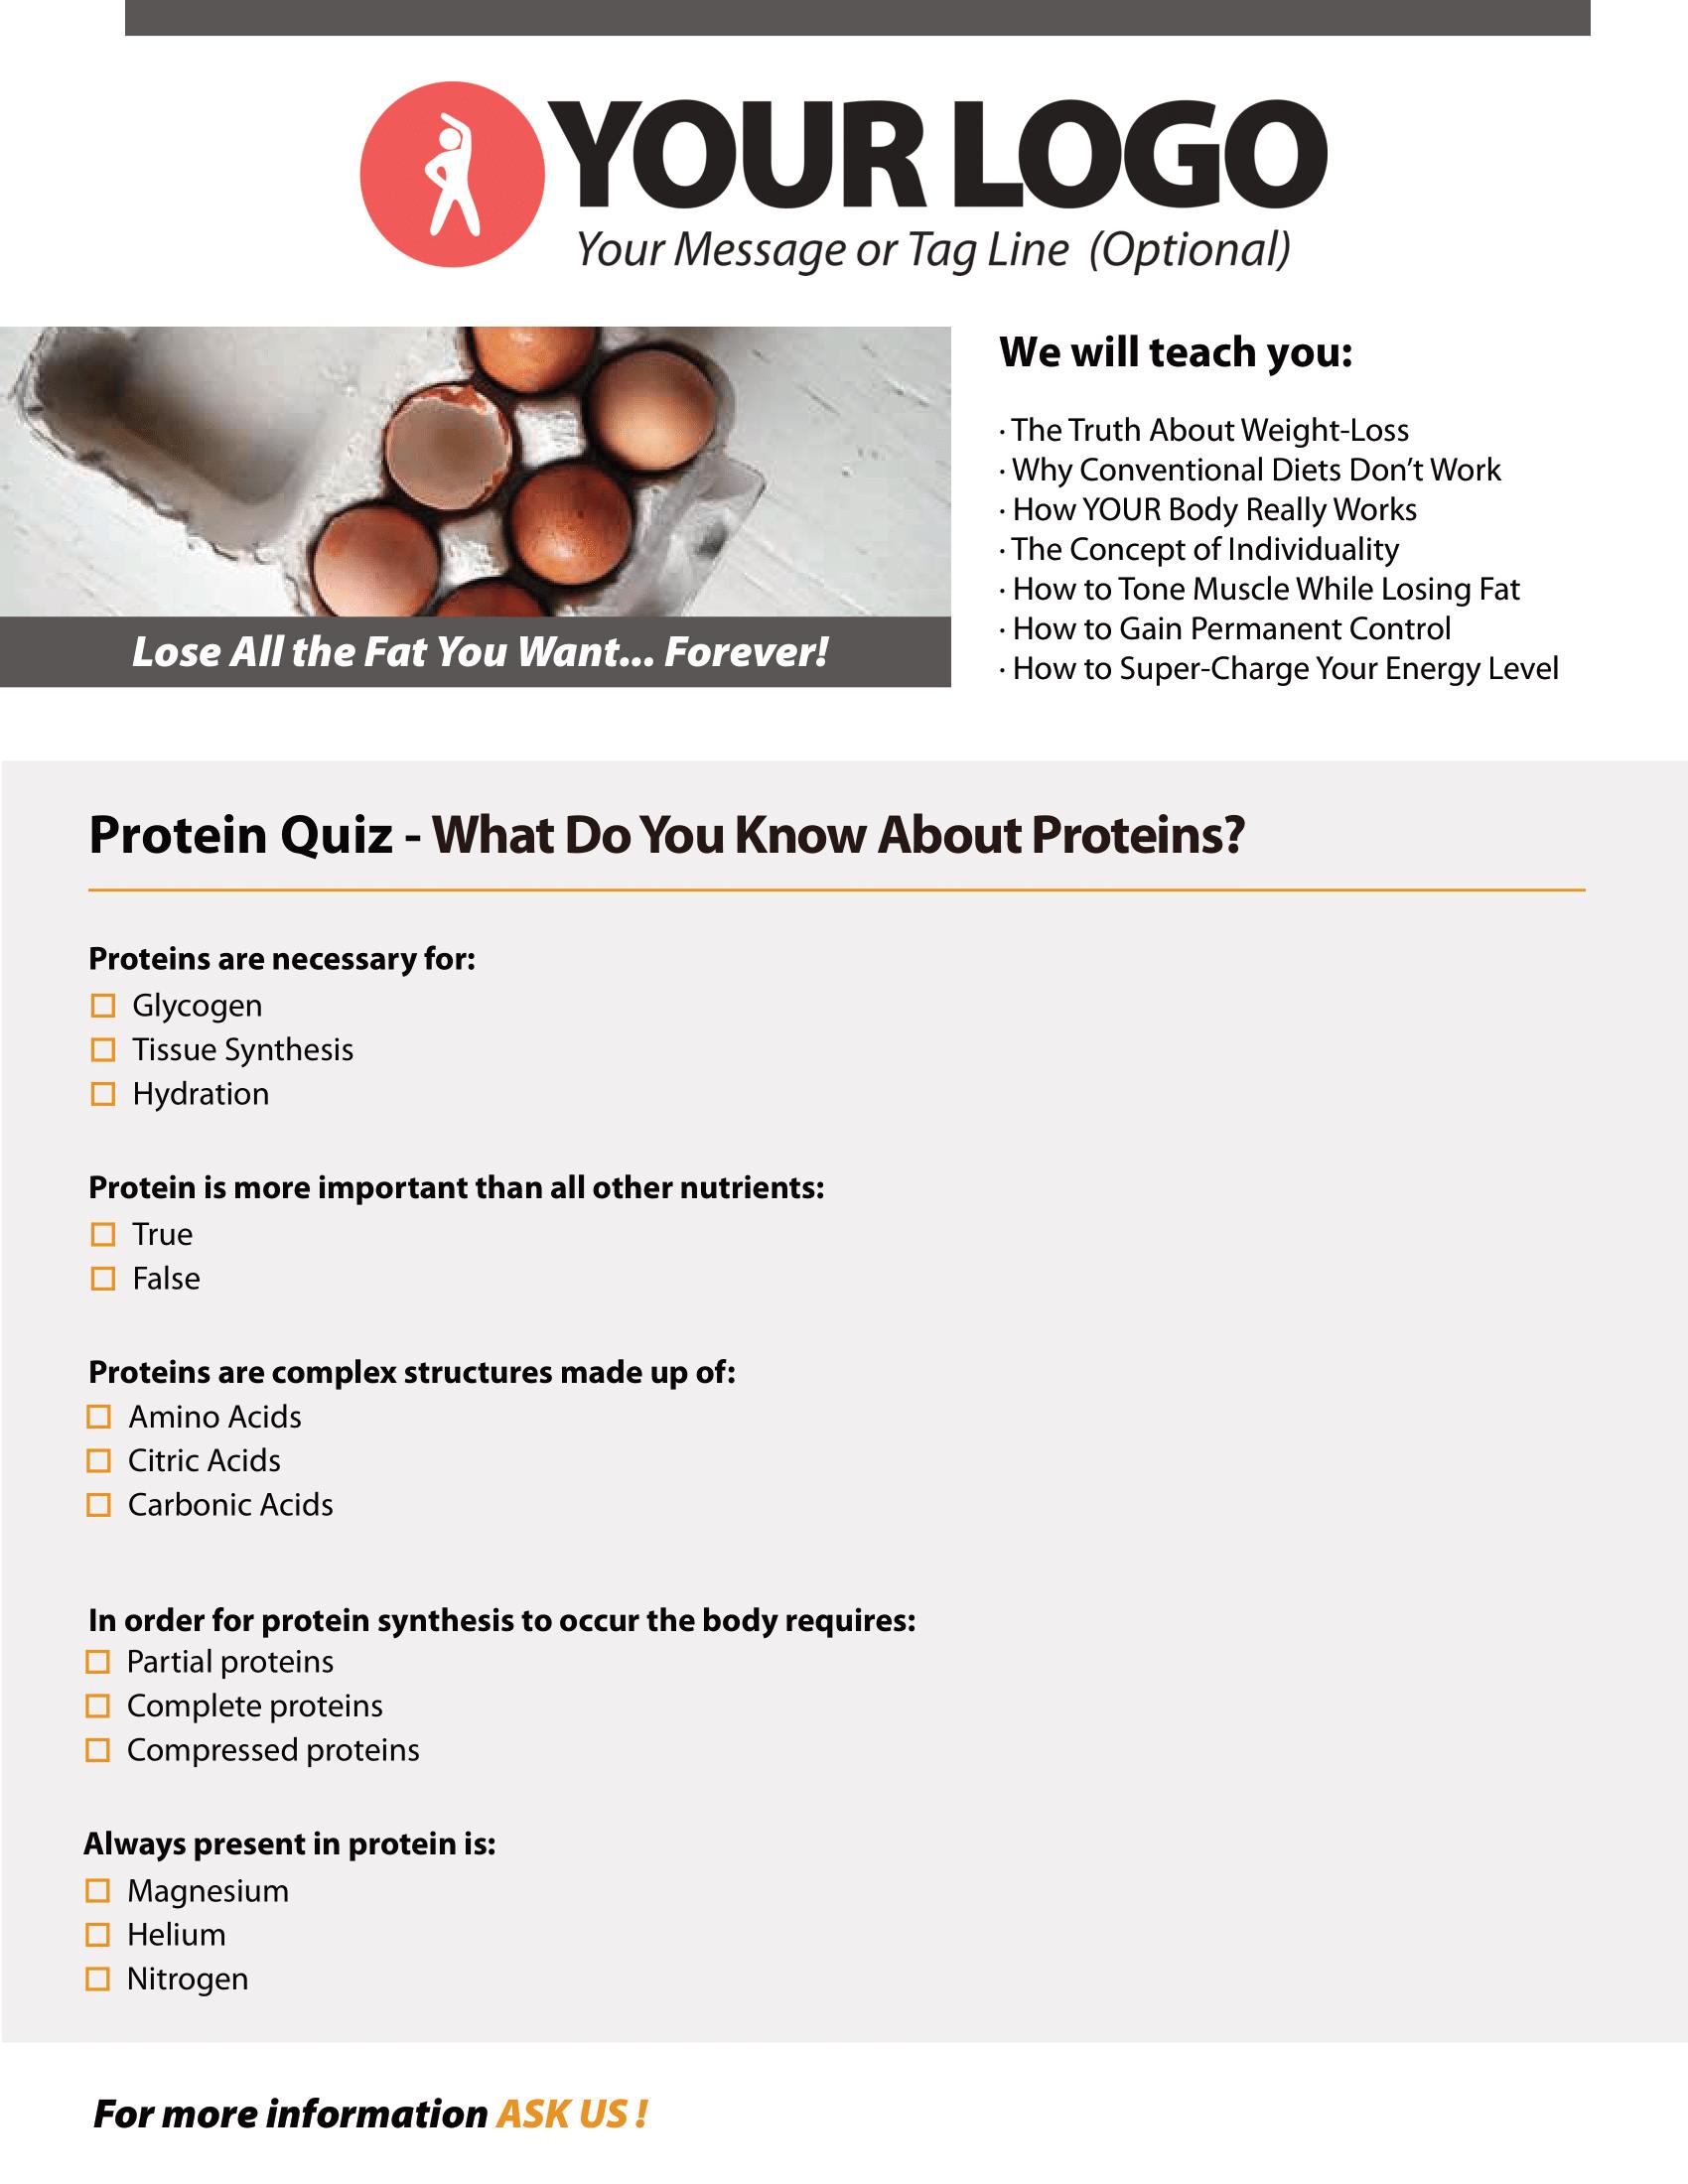 YOUR_LOGO_Quiz04_WE-1